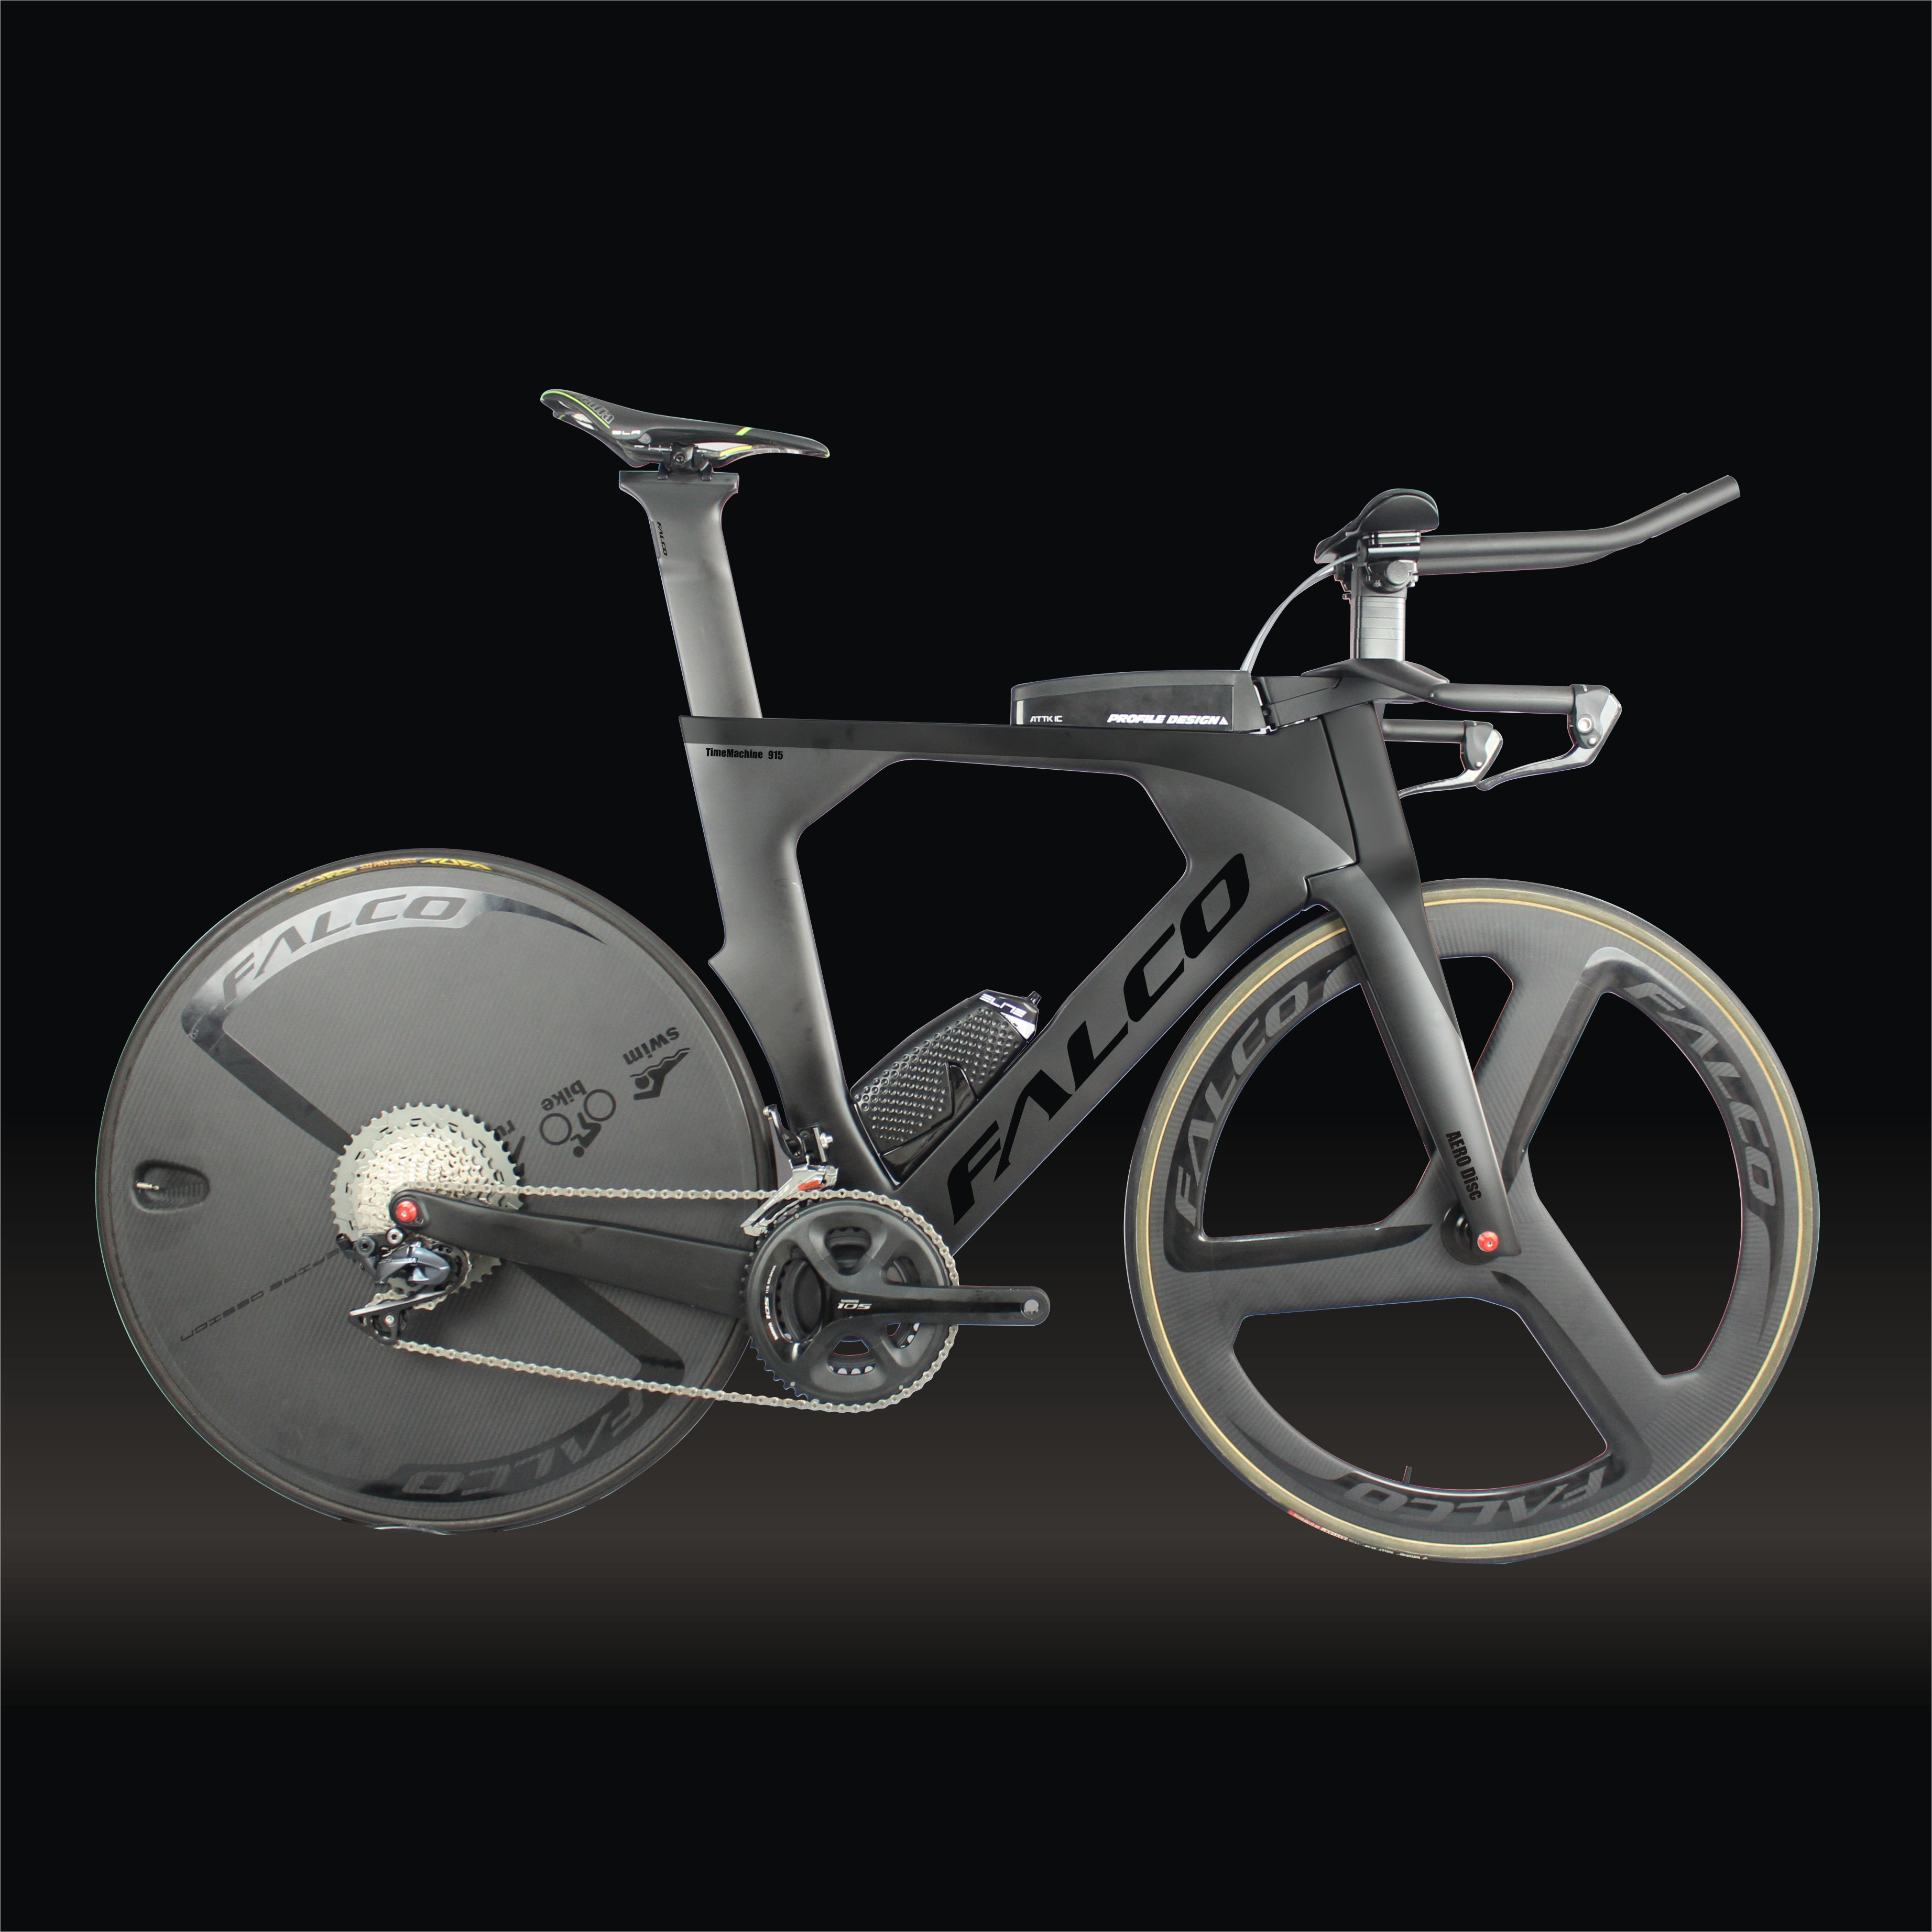 Bicicletas milagrosas 2020 bicicleta de Triatlón de carbono 48/52/54/56/58cm MARCO DE CARBONO tt marco de bicicleta de prueba de tiempo TT915